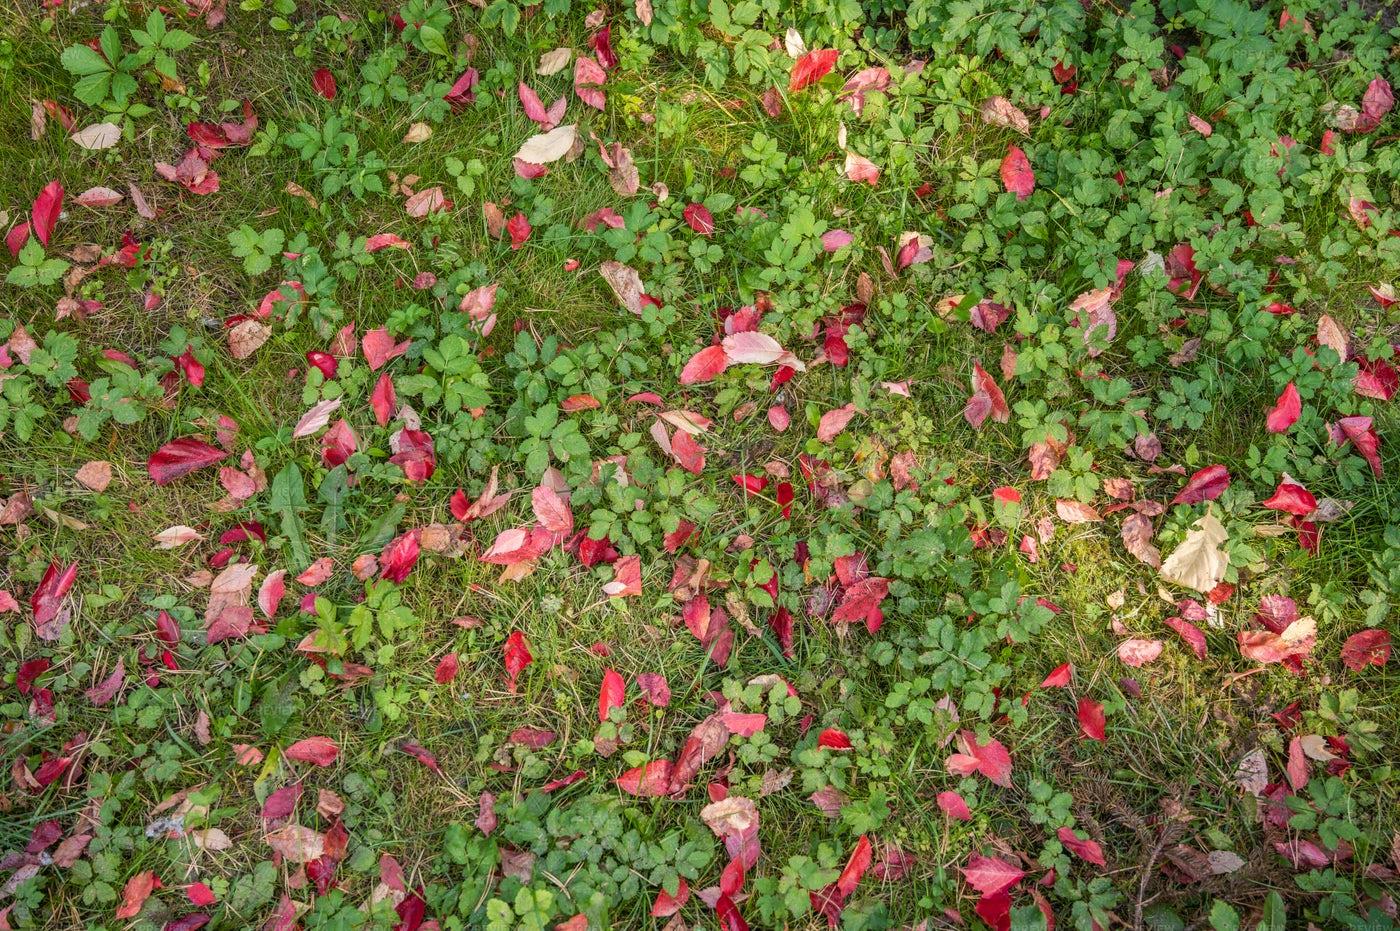 Glade With Green Grass: Stock Photos